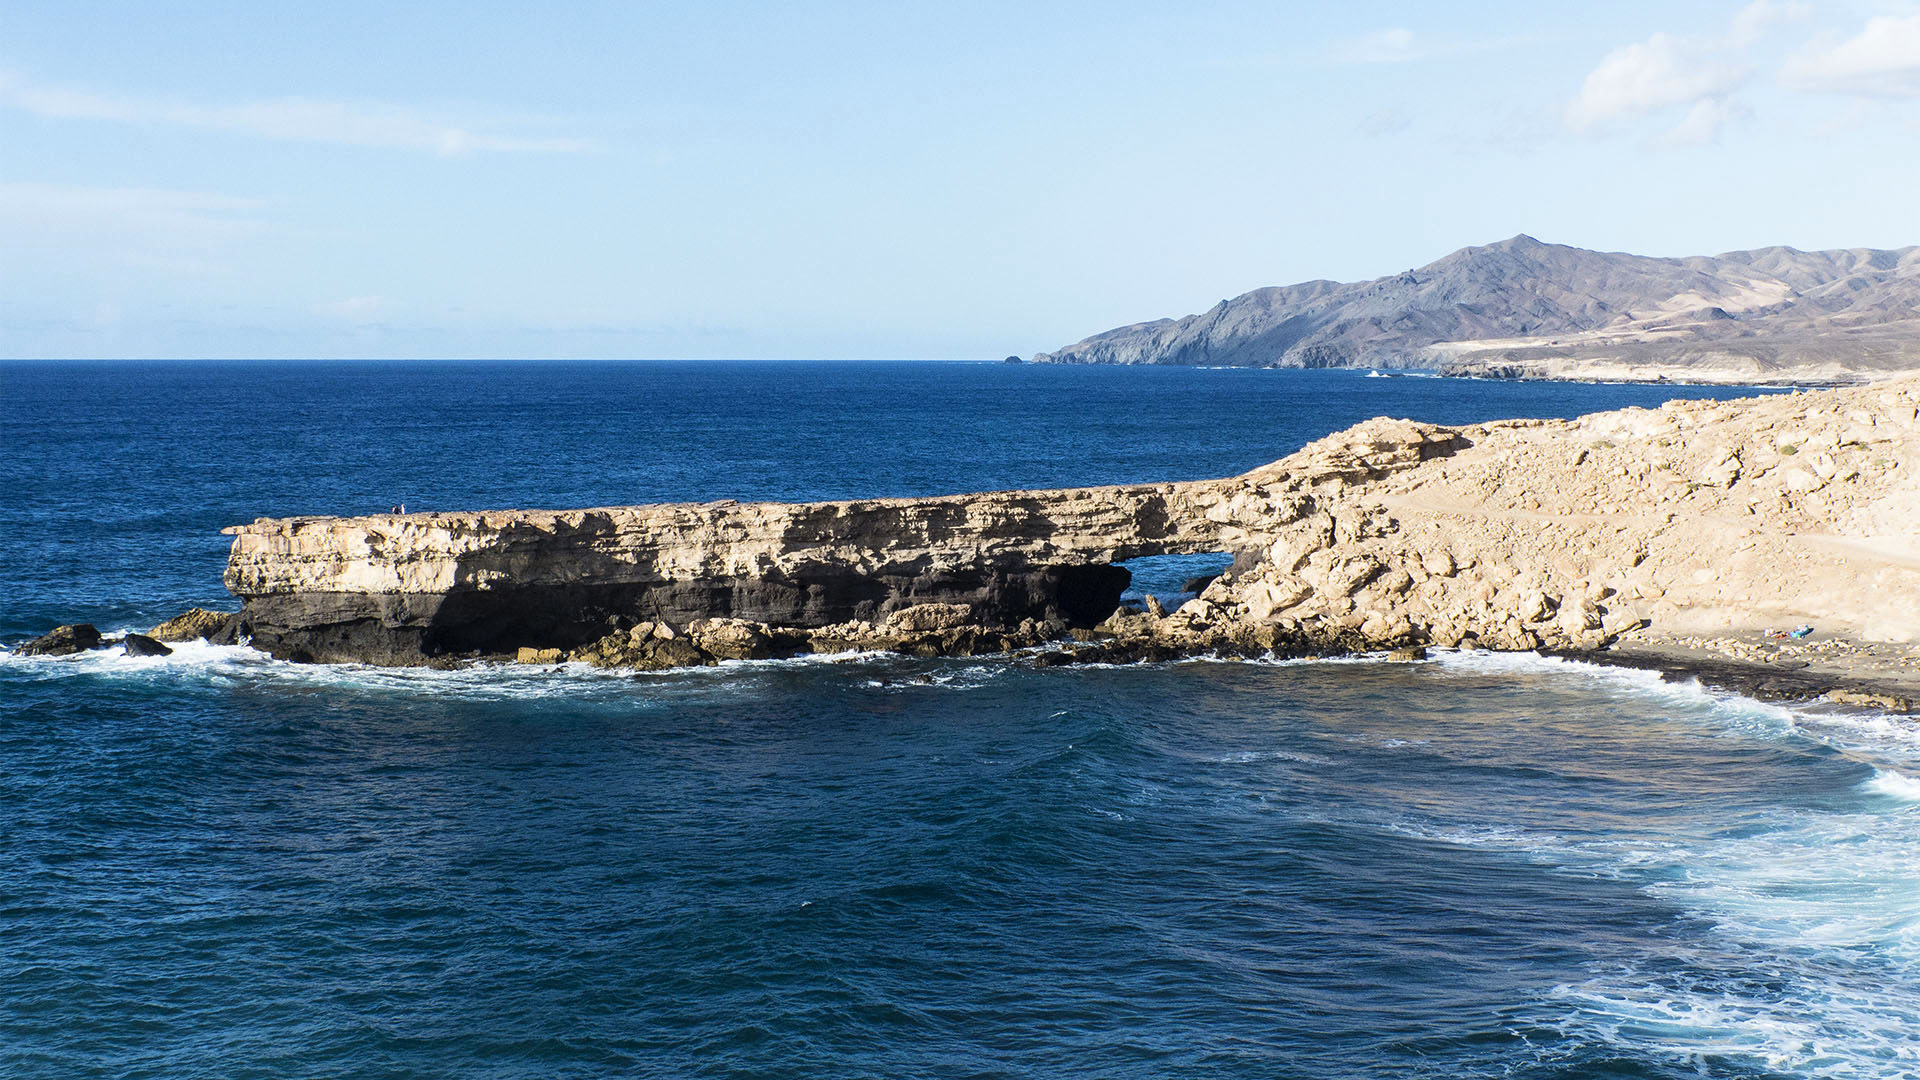 Fuerteventura Inselrundfahrt Südschleife – La Pared Punta de Guadelupe Felsentor.